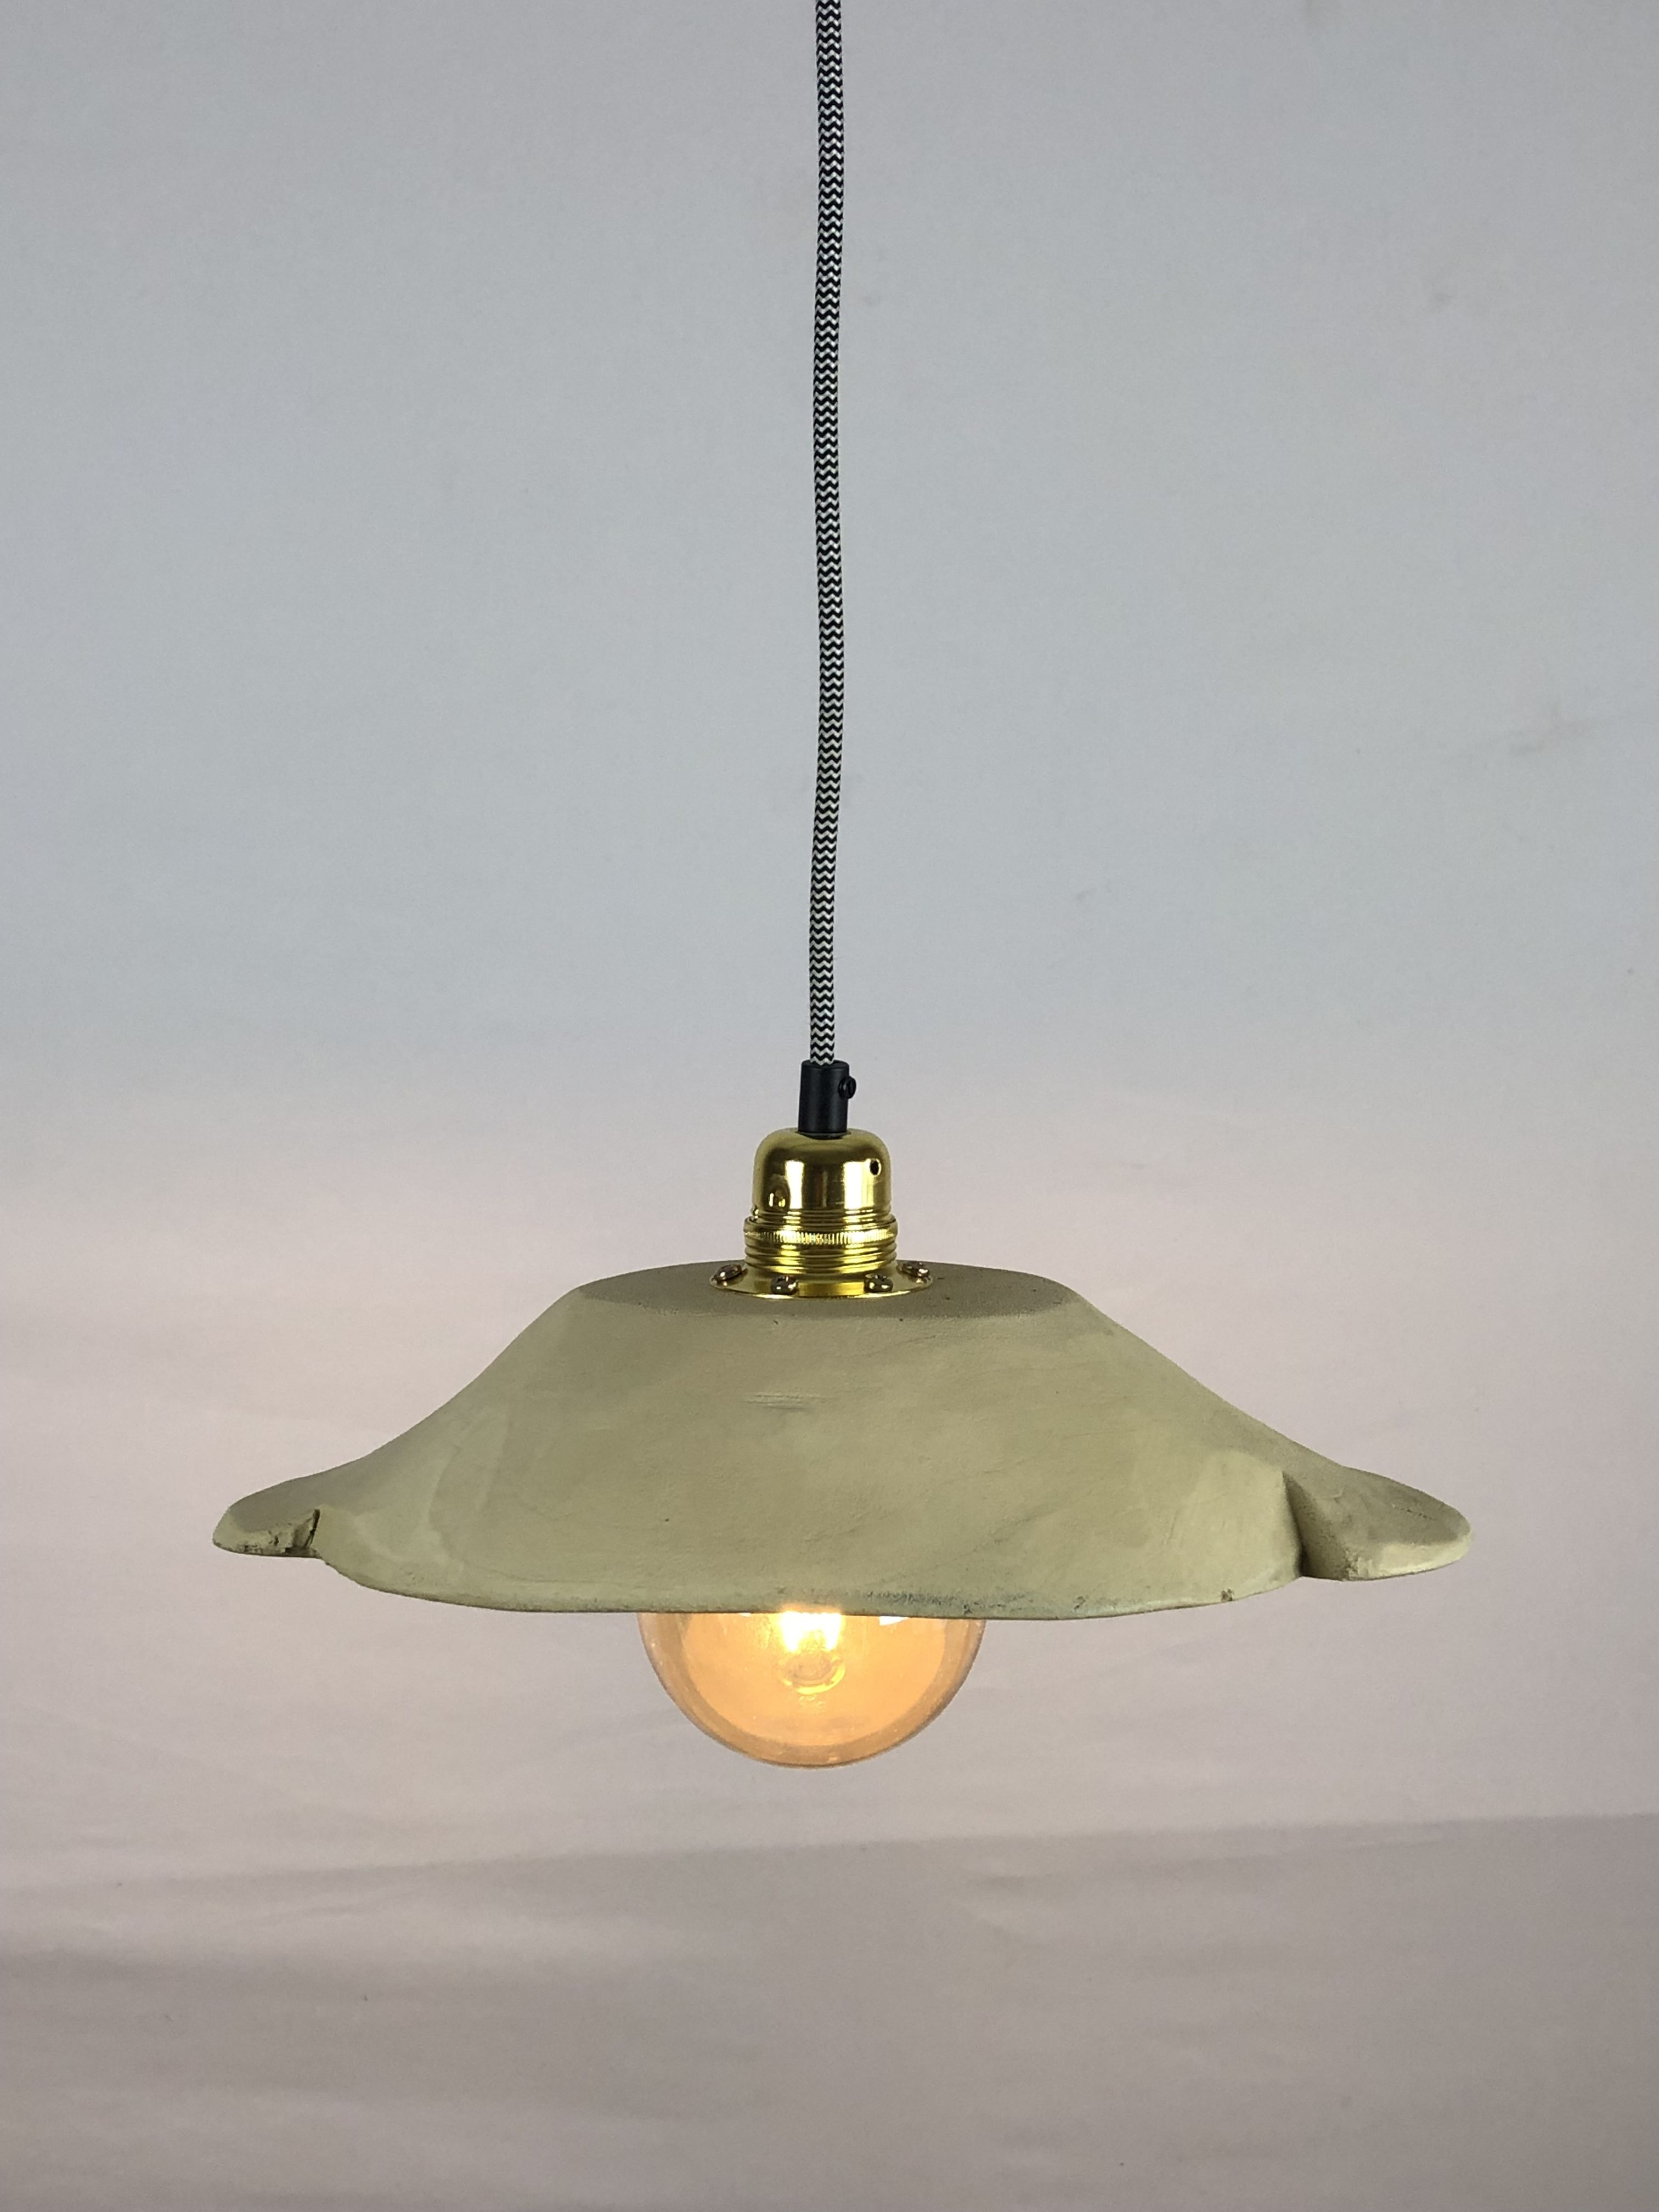 Vintage Design Lampe   Schöne lampen, Design lampen, Lampen